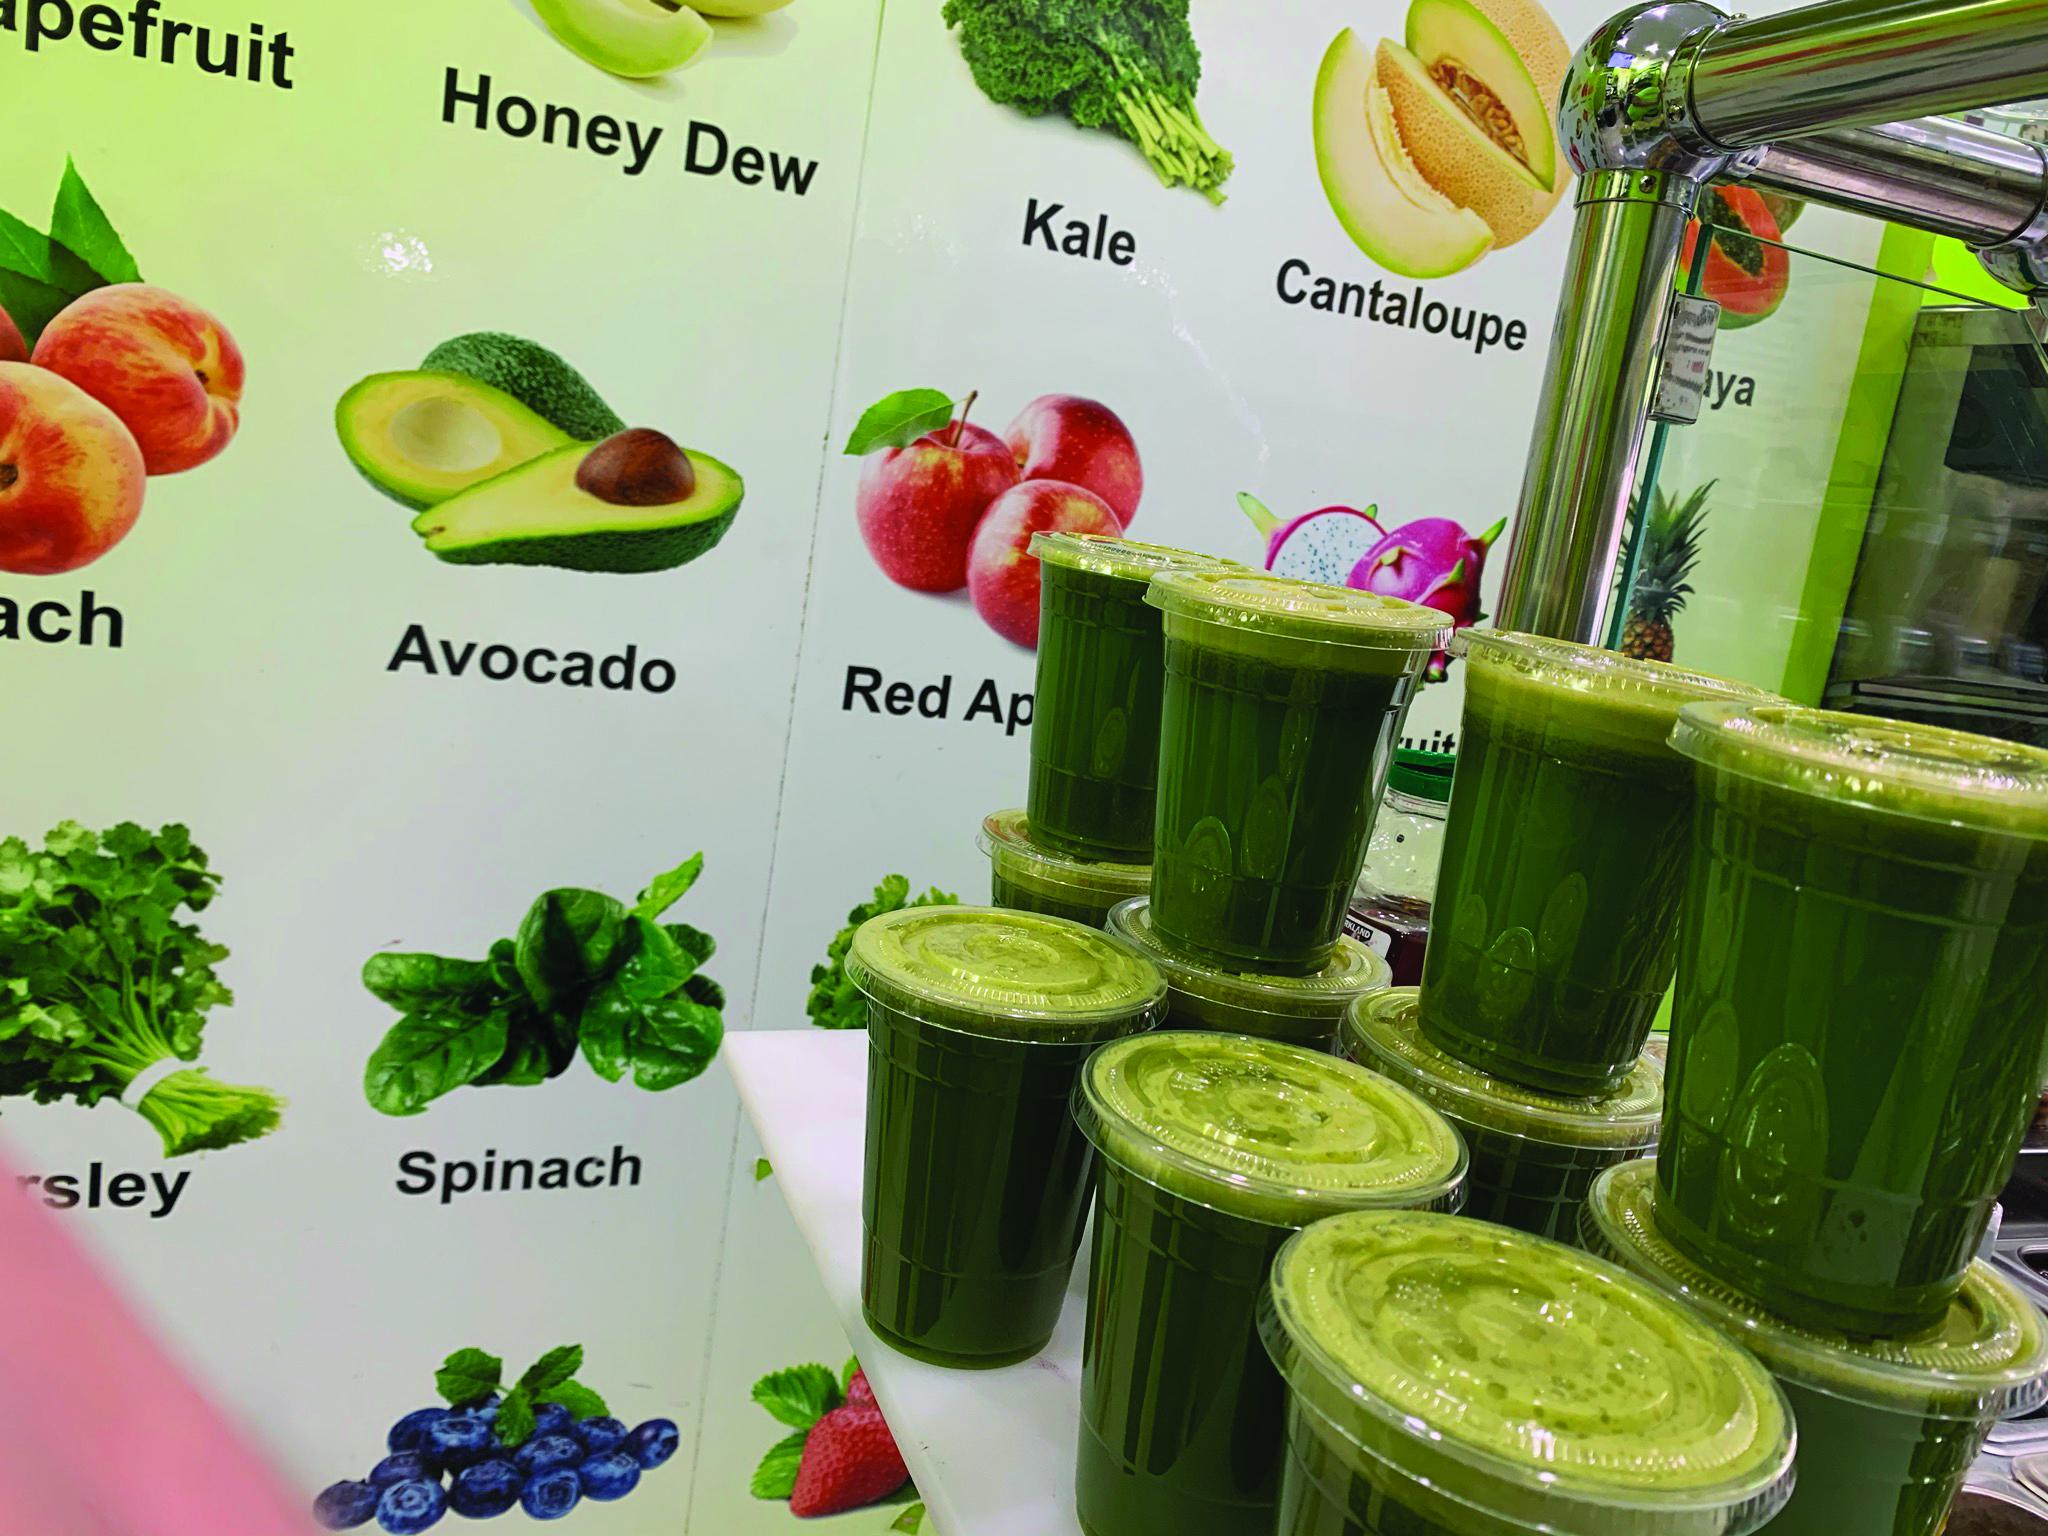 Image/Green Apple Delight Astoria Facebook